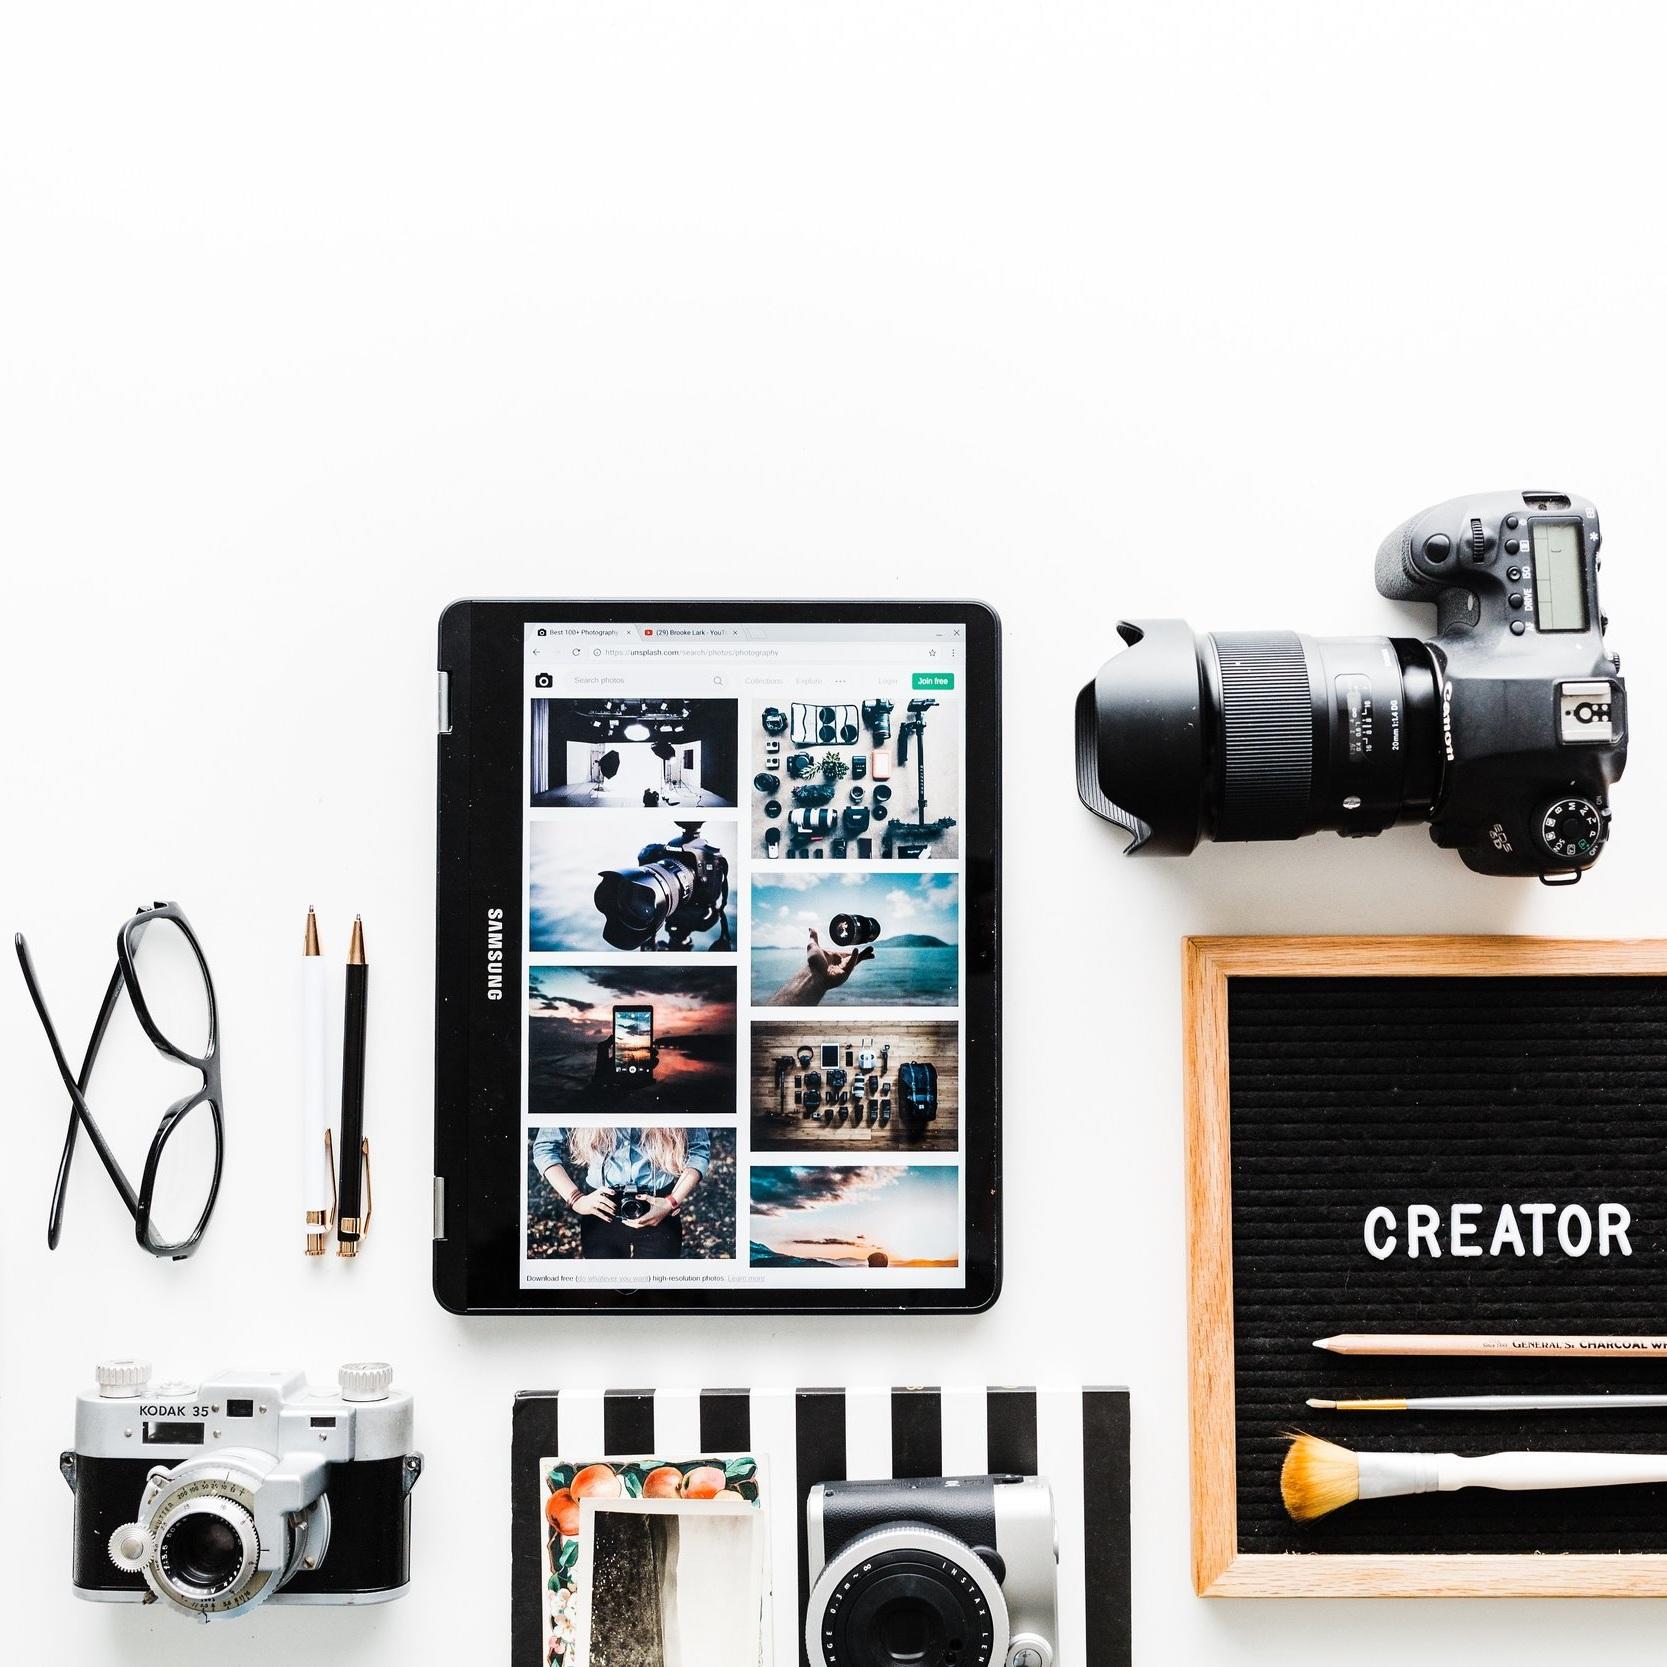 Creating a good website -